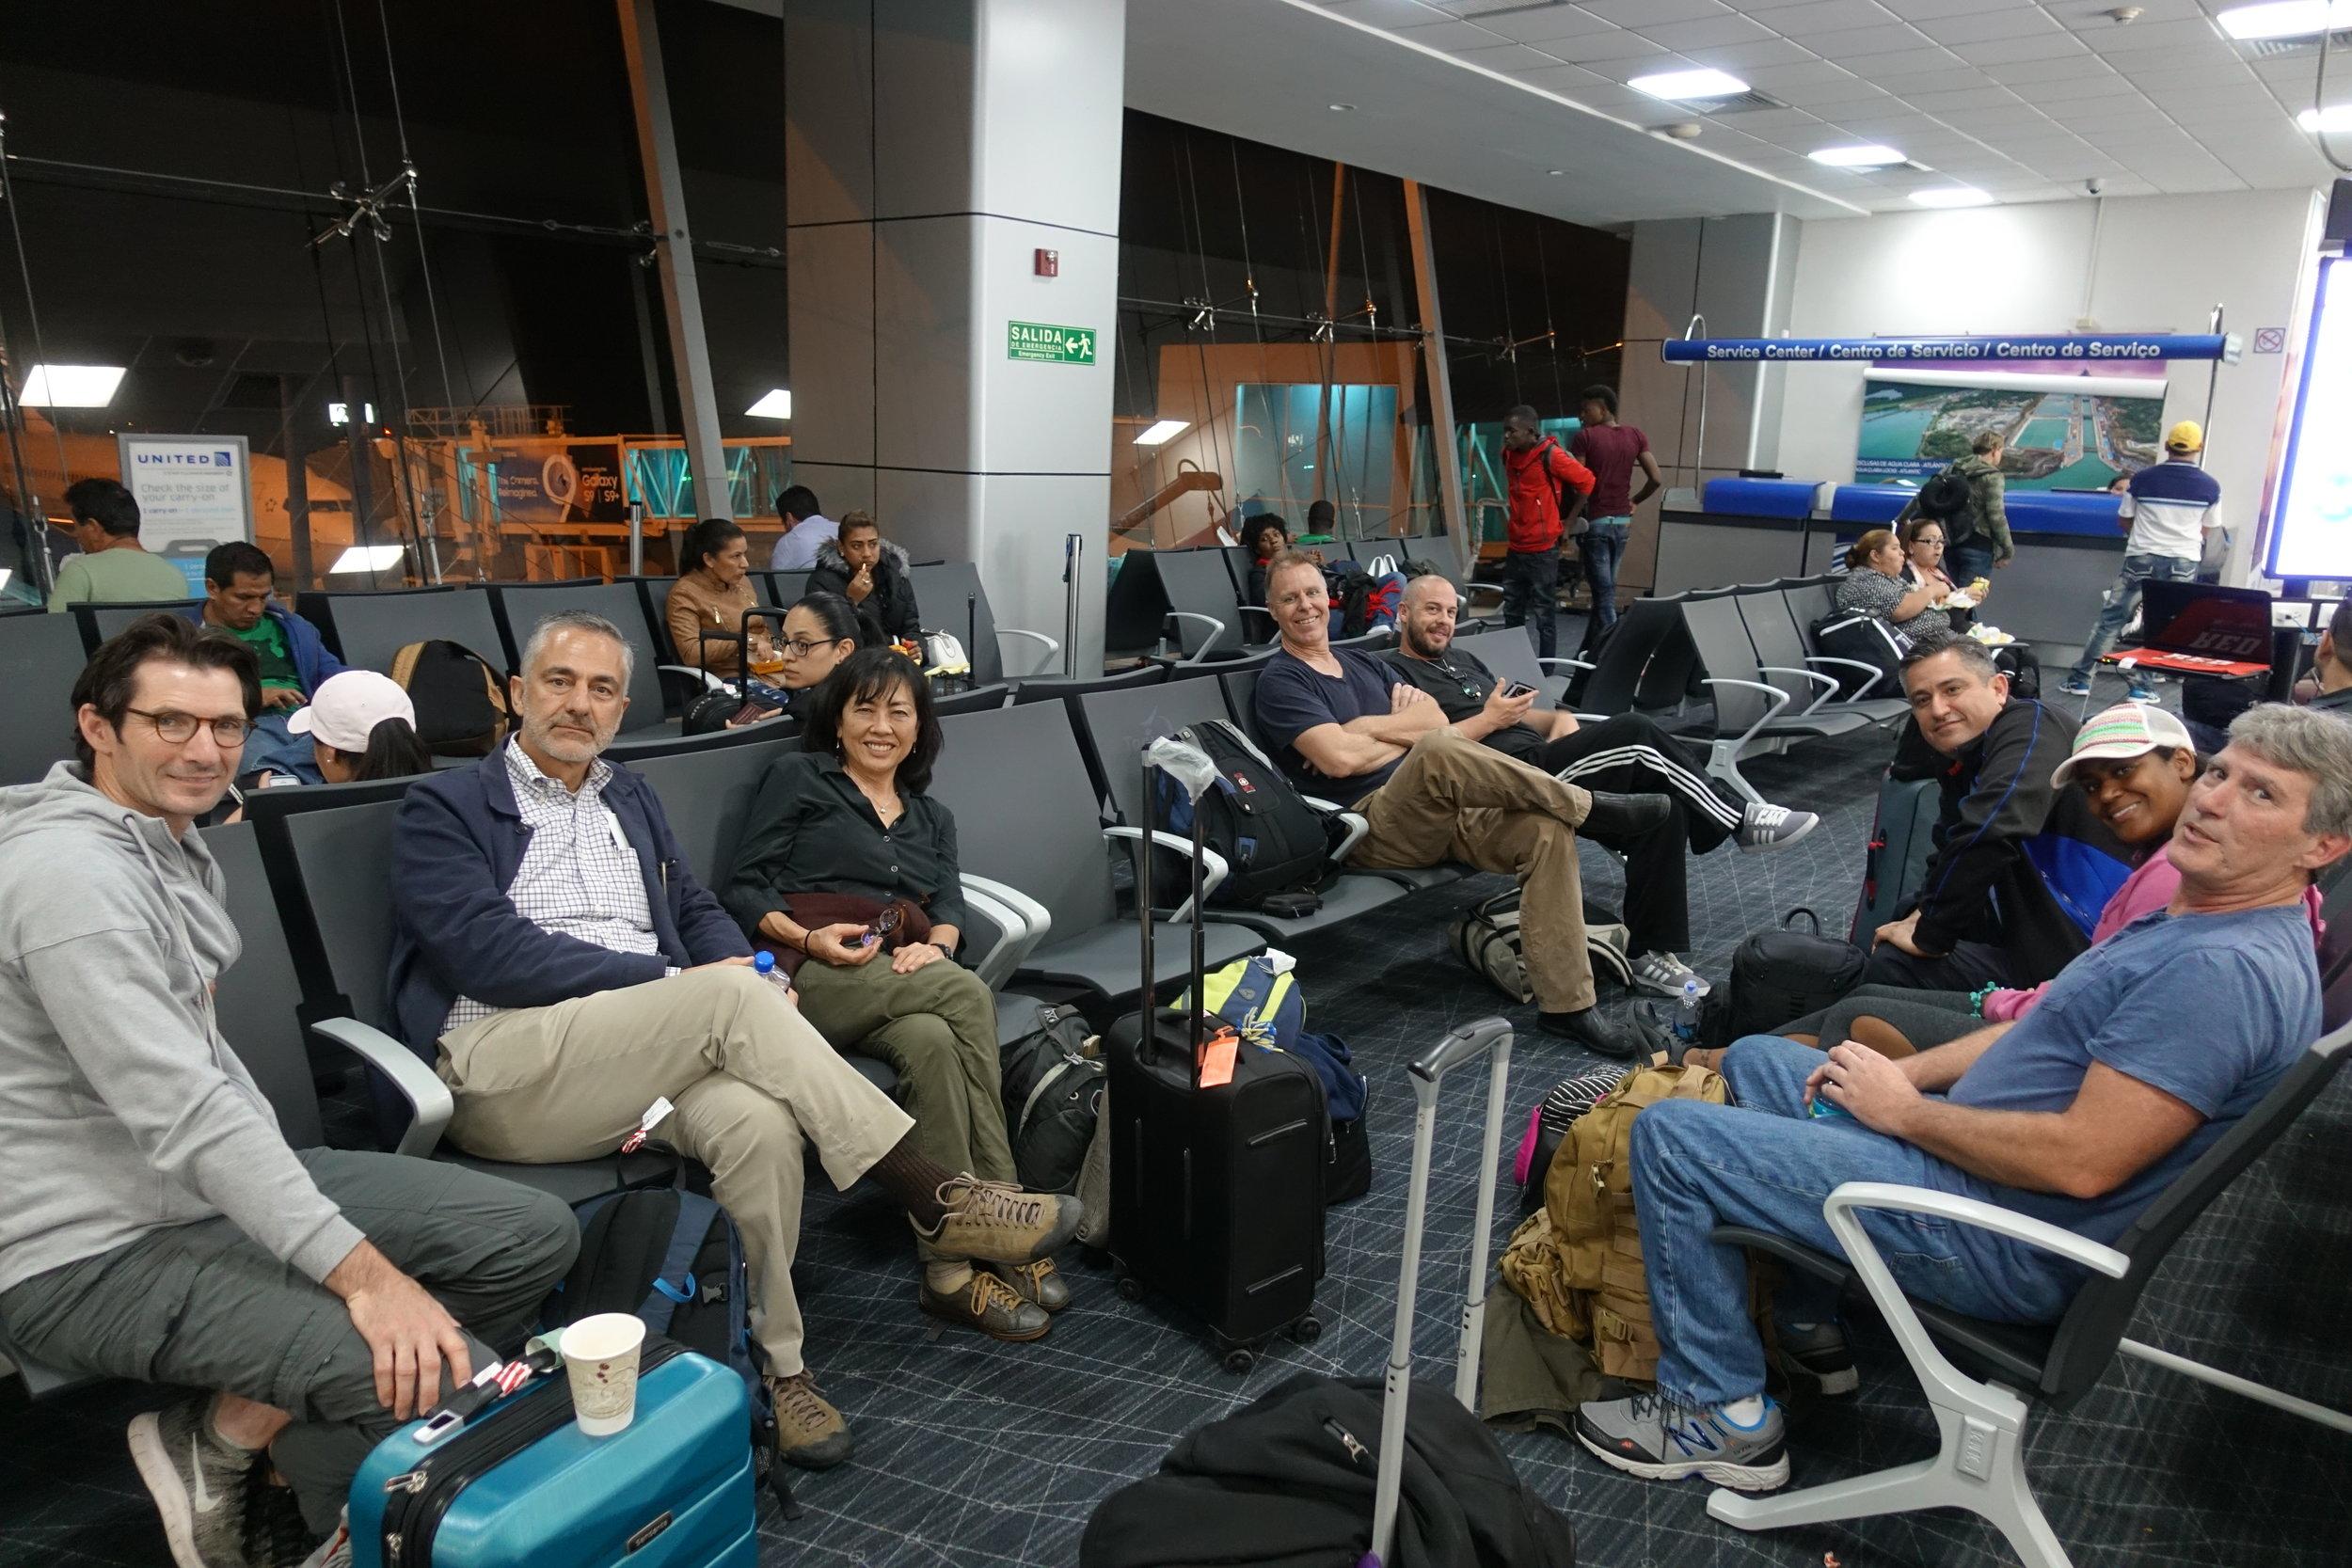 Chris Pivik, Touraj Touran, Jan Takasugi, Jeff Bartlett, Mikey Hibbard, Robert Casillas, Natalie Robinson, Patrick Leary at airport in Panama!